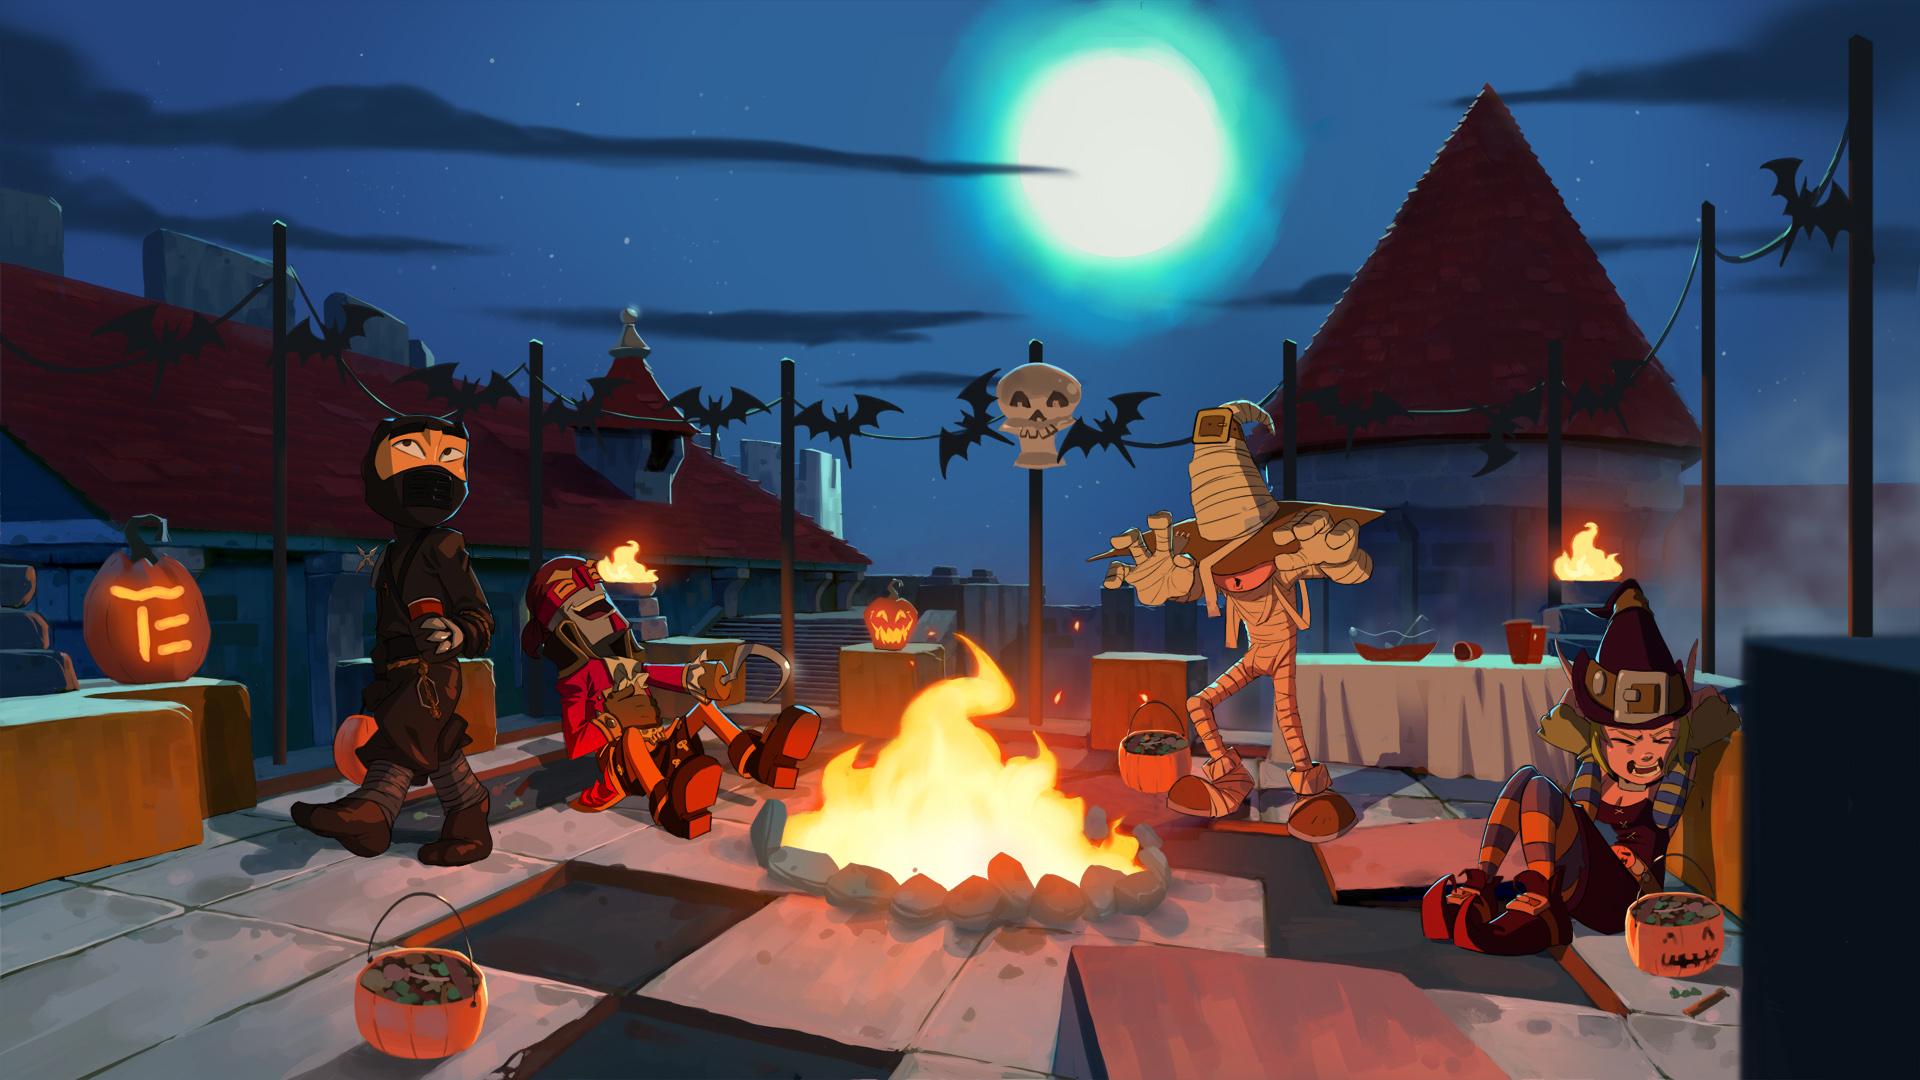 cartoon-halloween-image